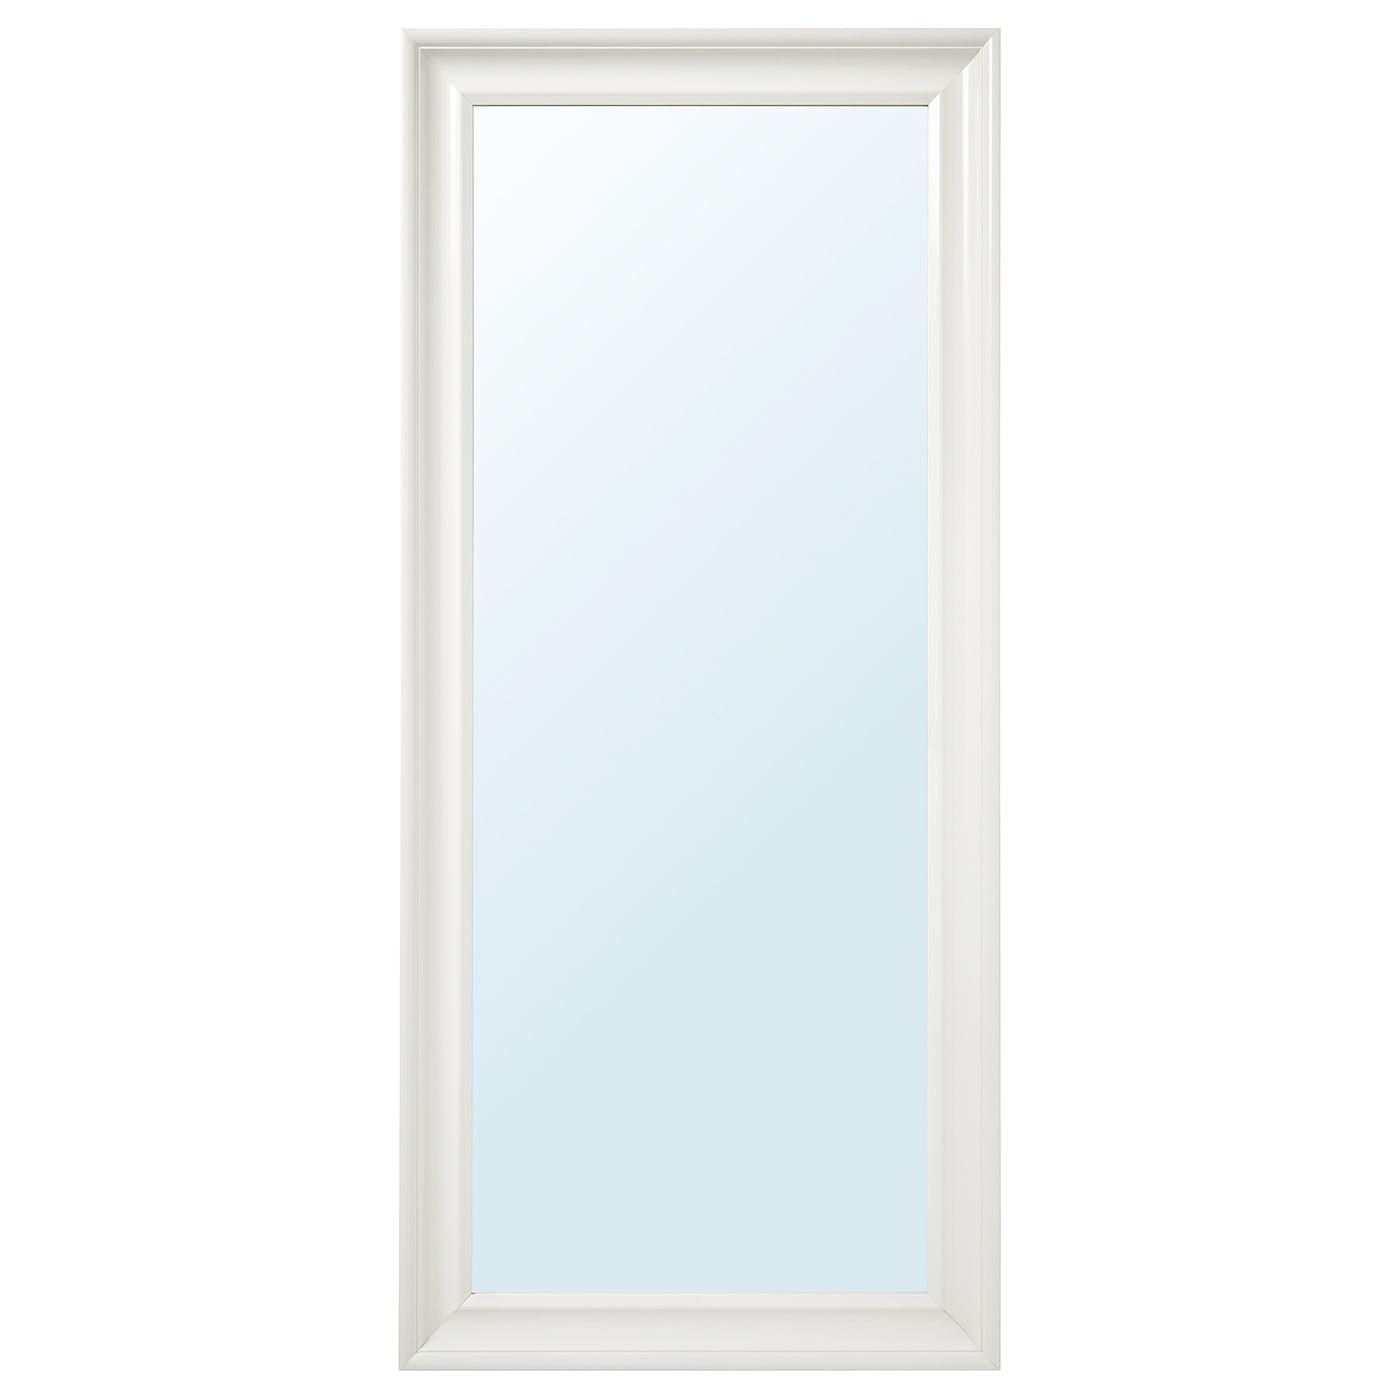 Hemnes Mirror White 74 X 165 Cm Ikea